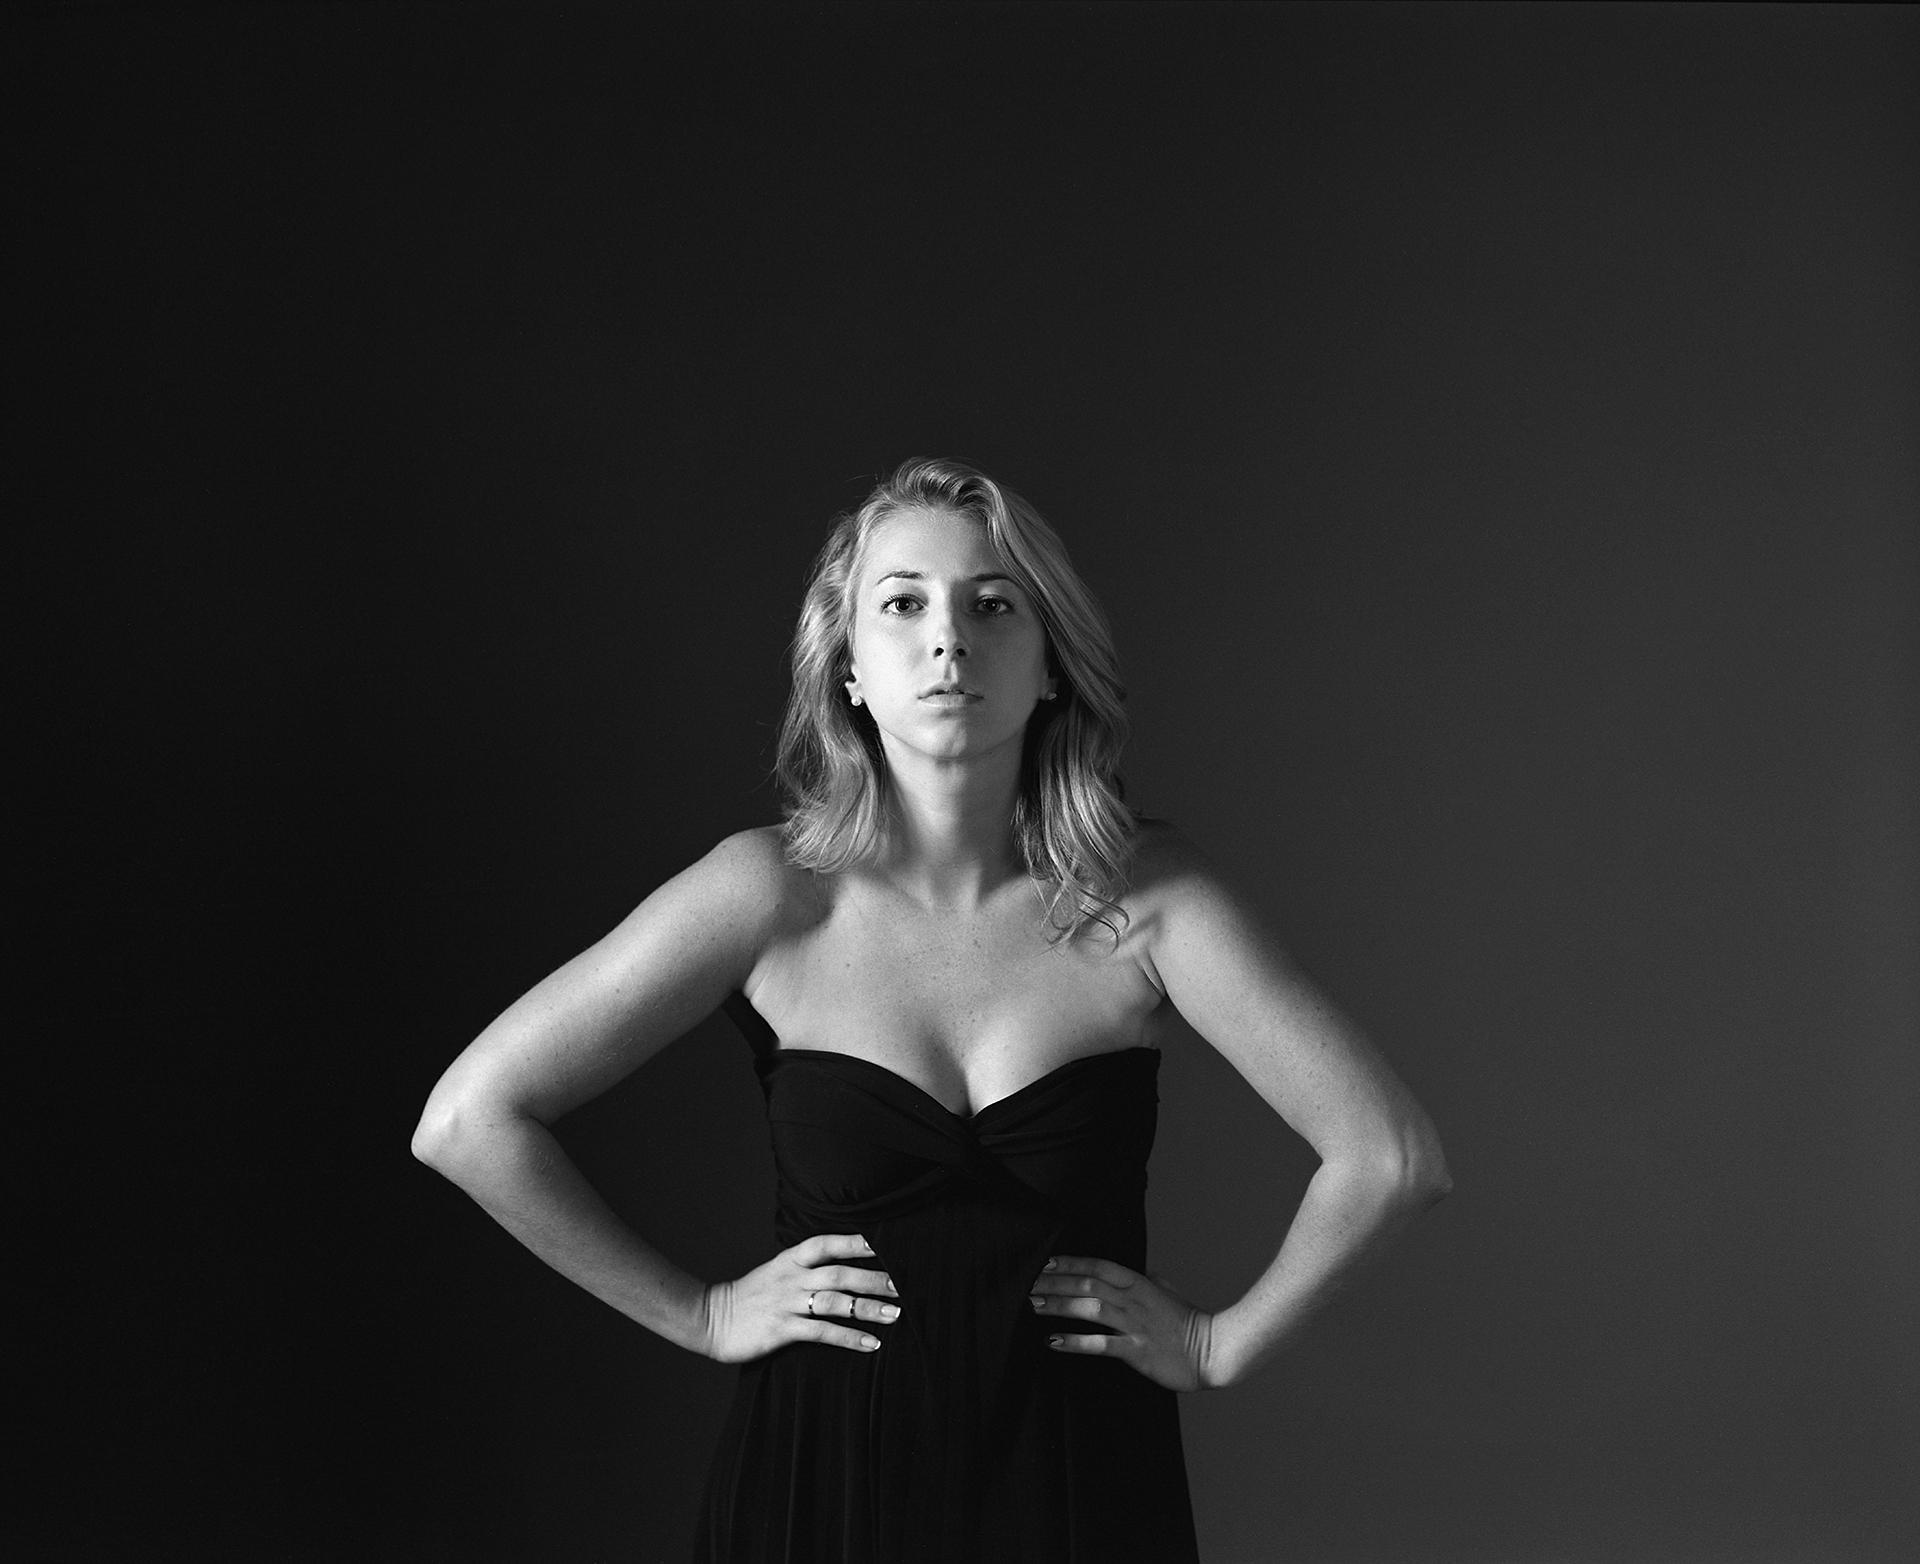 Black & white 1/2 length portrait of blonde model Tasha facing the camera head on in the studio